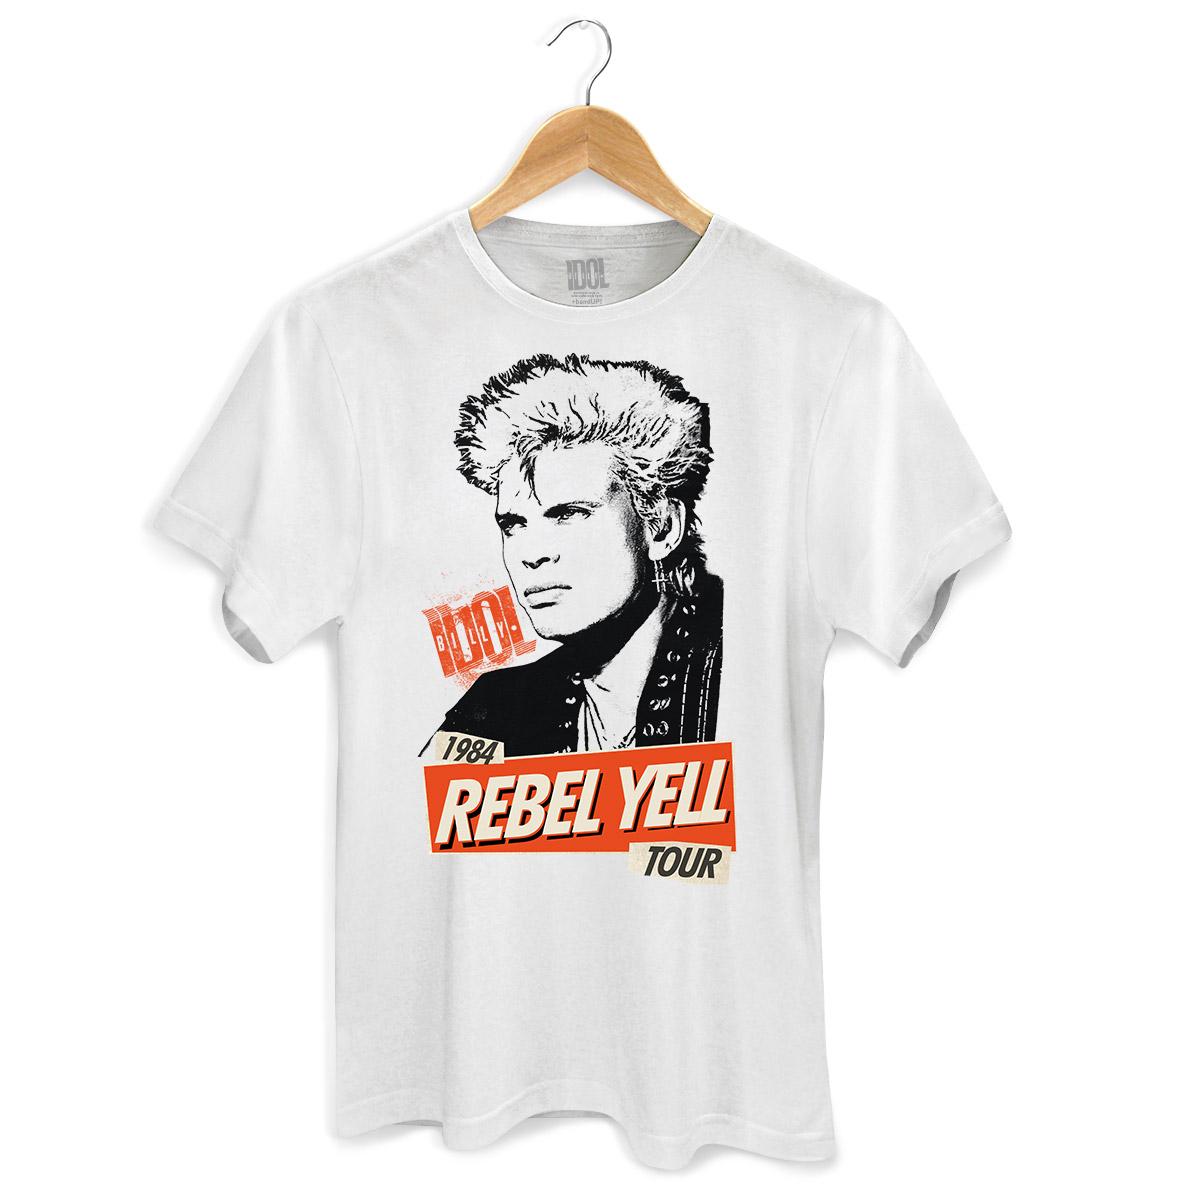 Camiseta Masculina Billy Idol 1984 Rebel Yell Tour